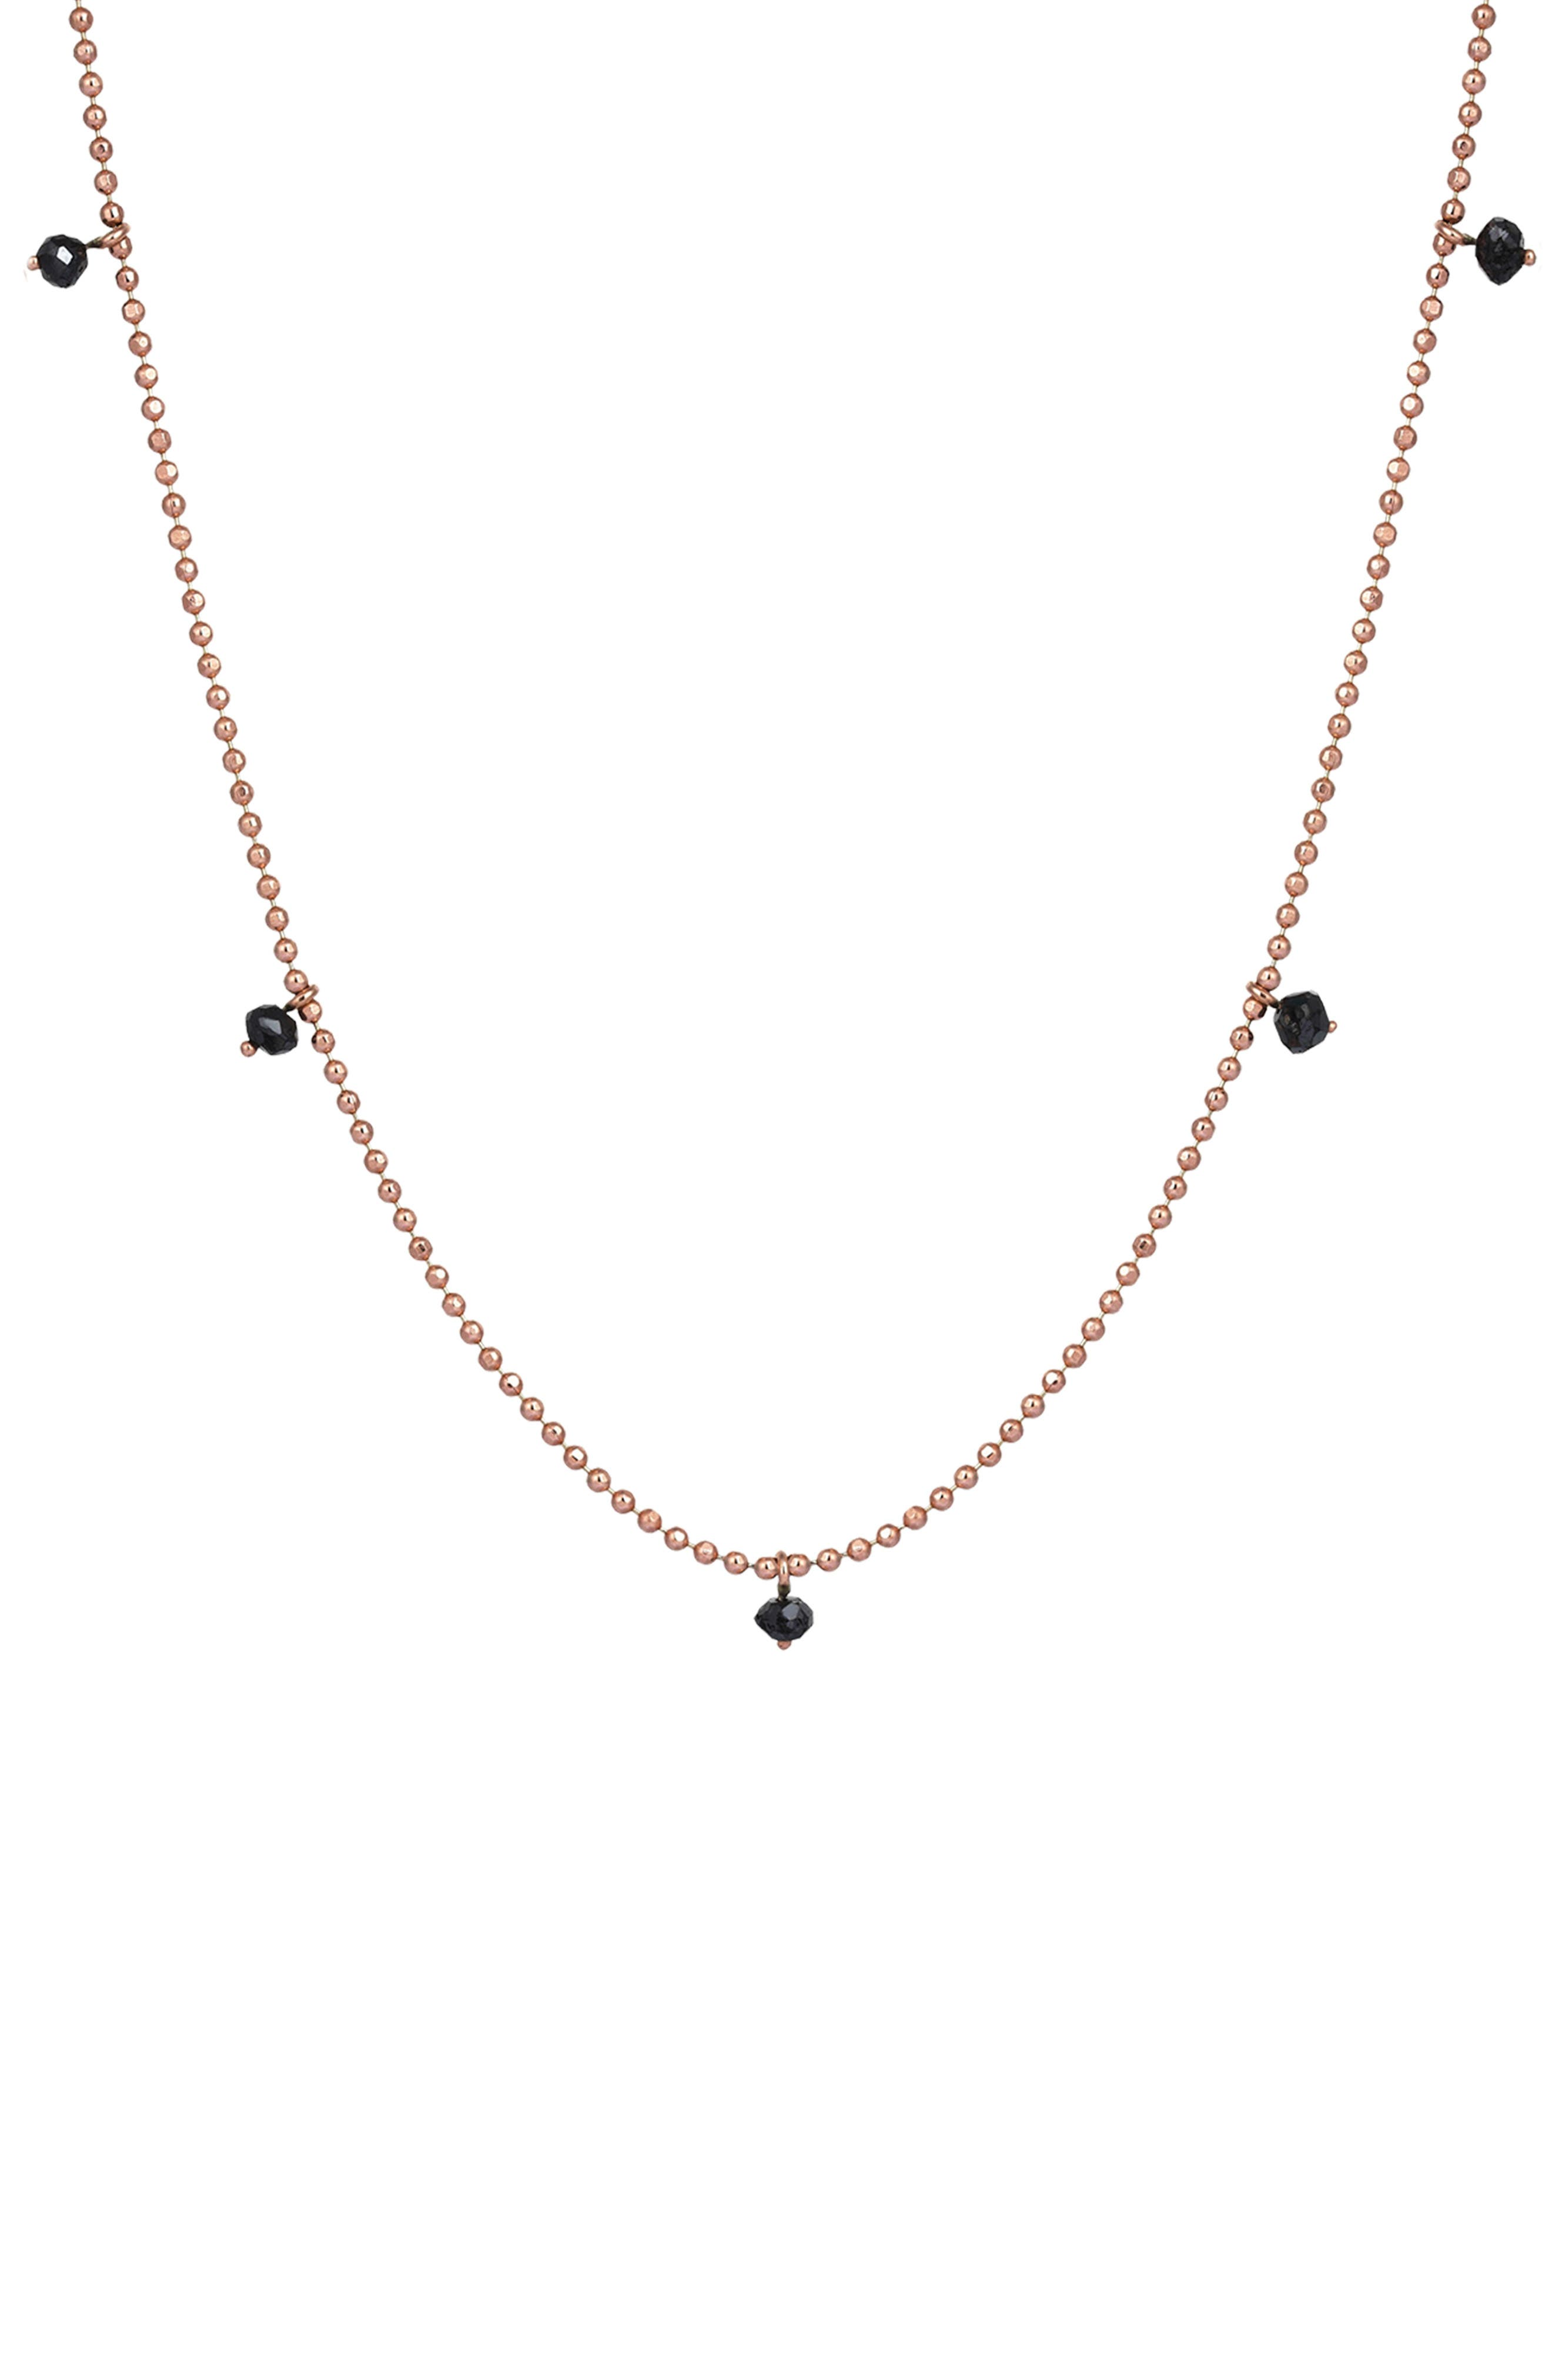 Black Diamond Pendant Necklace,                             Main thumbnail 1, color,                             ROSE GOLD